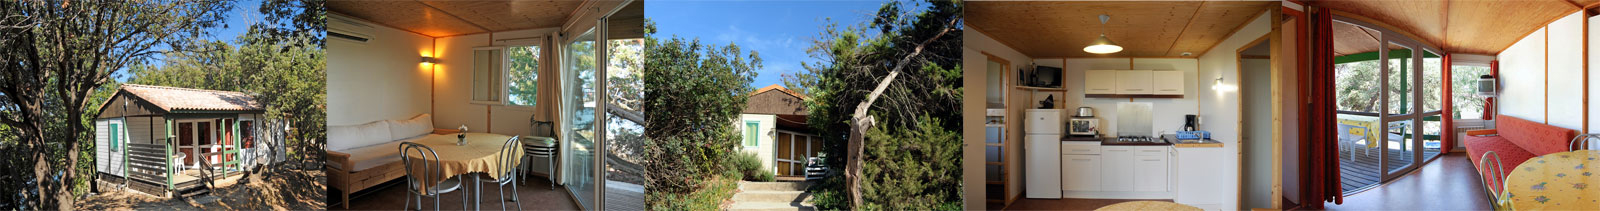 thalasso-corse-hebergement-bungalow-sere